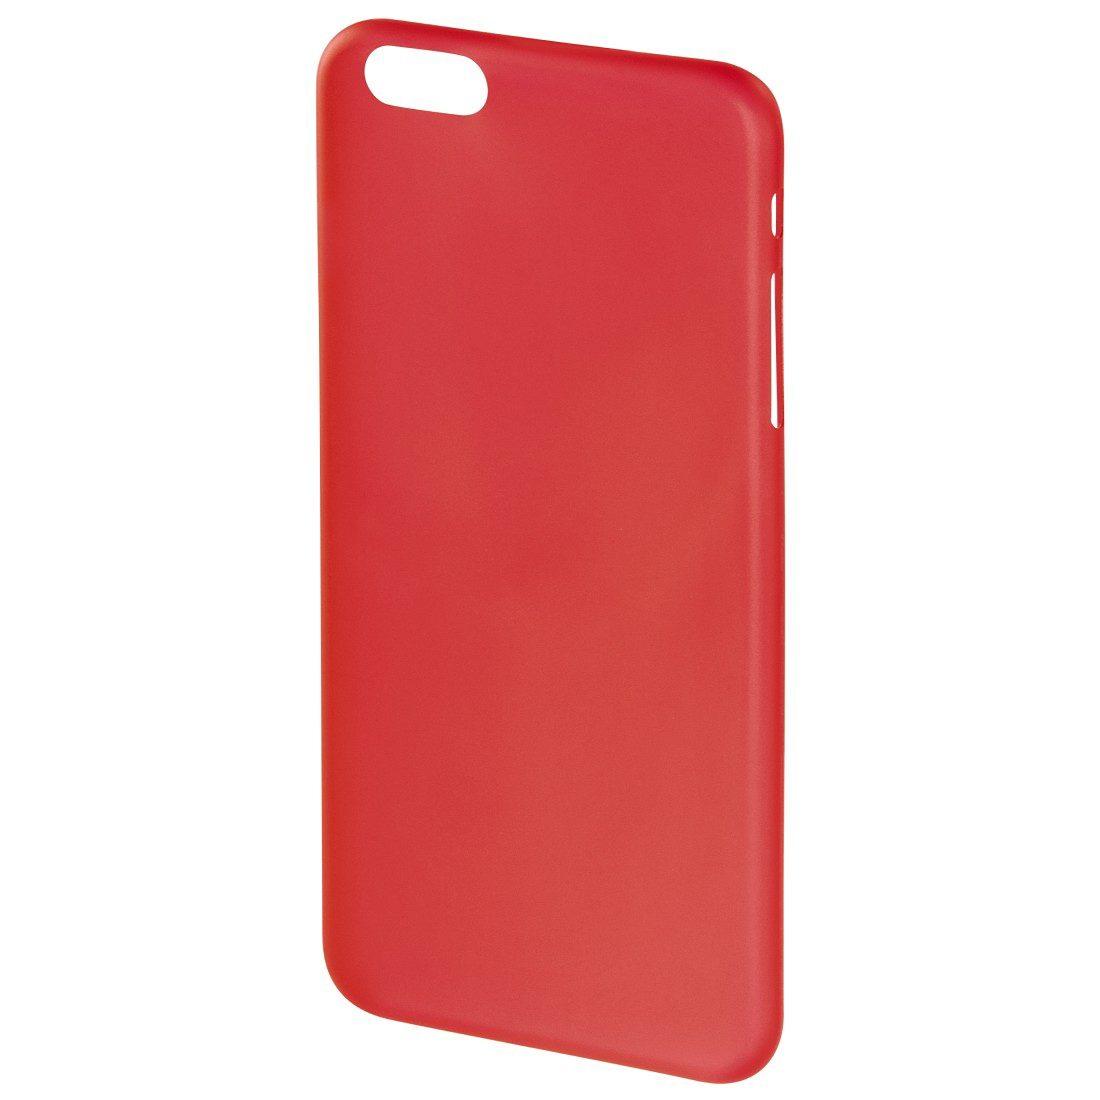 Hama Cover Ultra Slim für Apple iPhone 6/6s, Rot